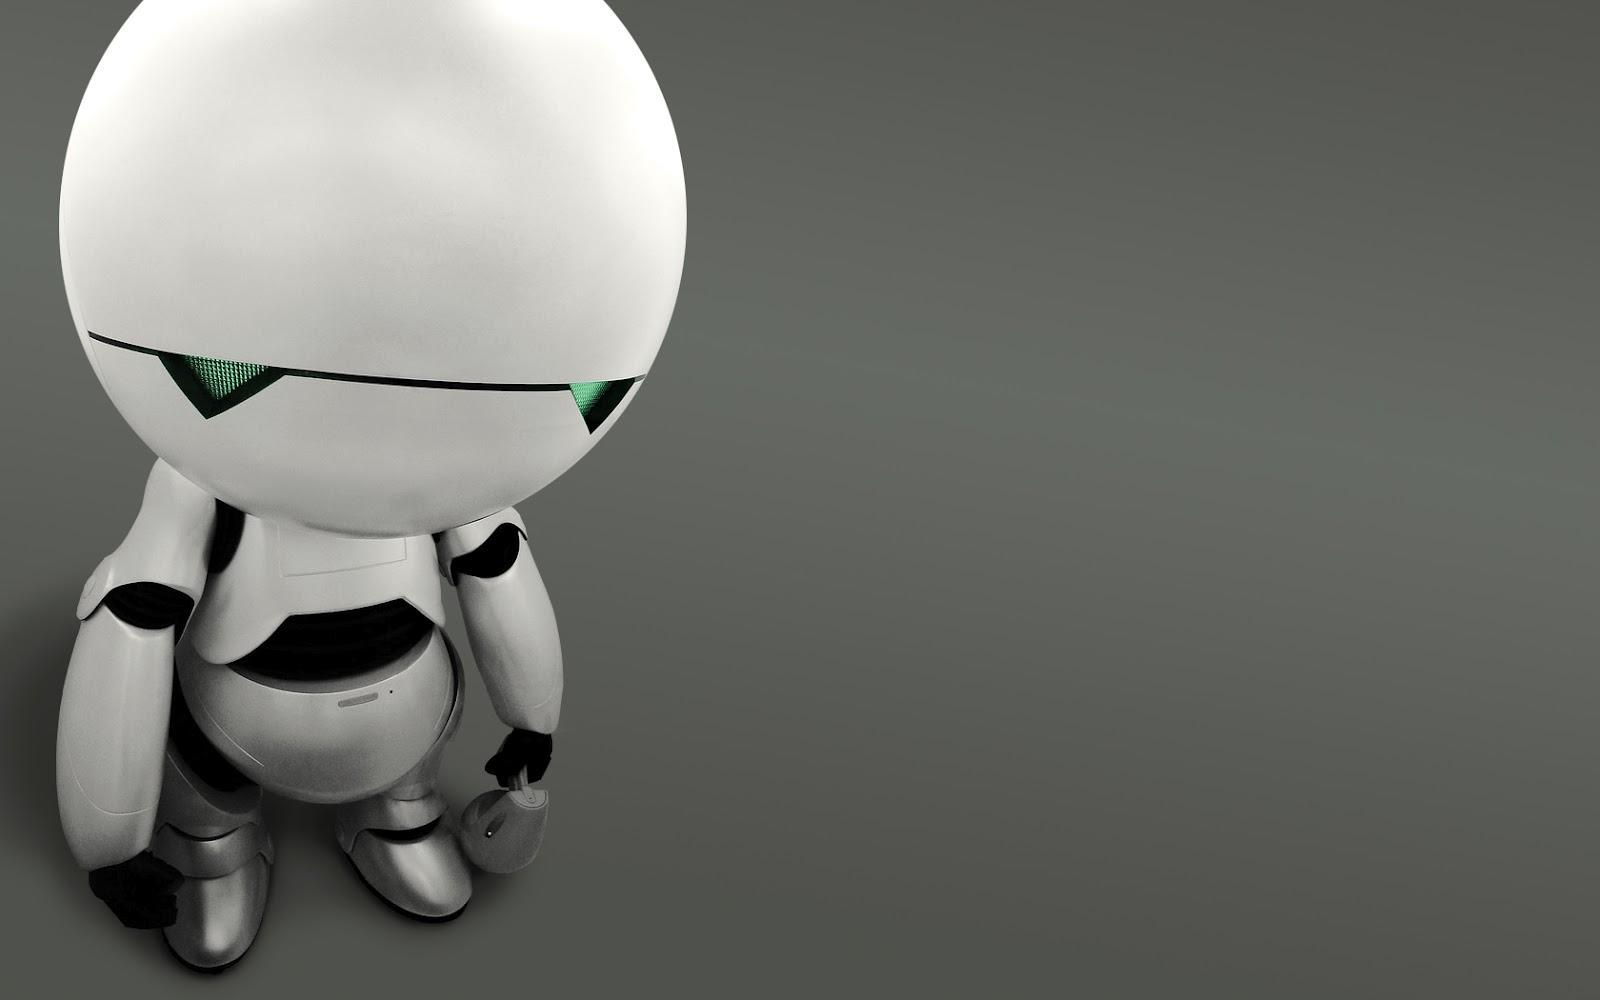 Cute Robot Wallpaper Top HD Wallpapers 1600x1000